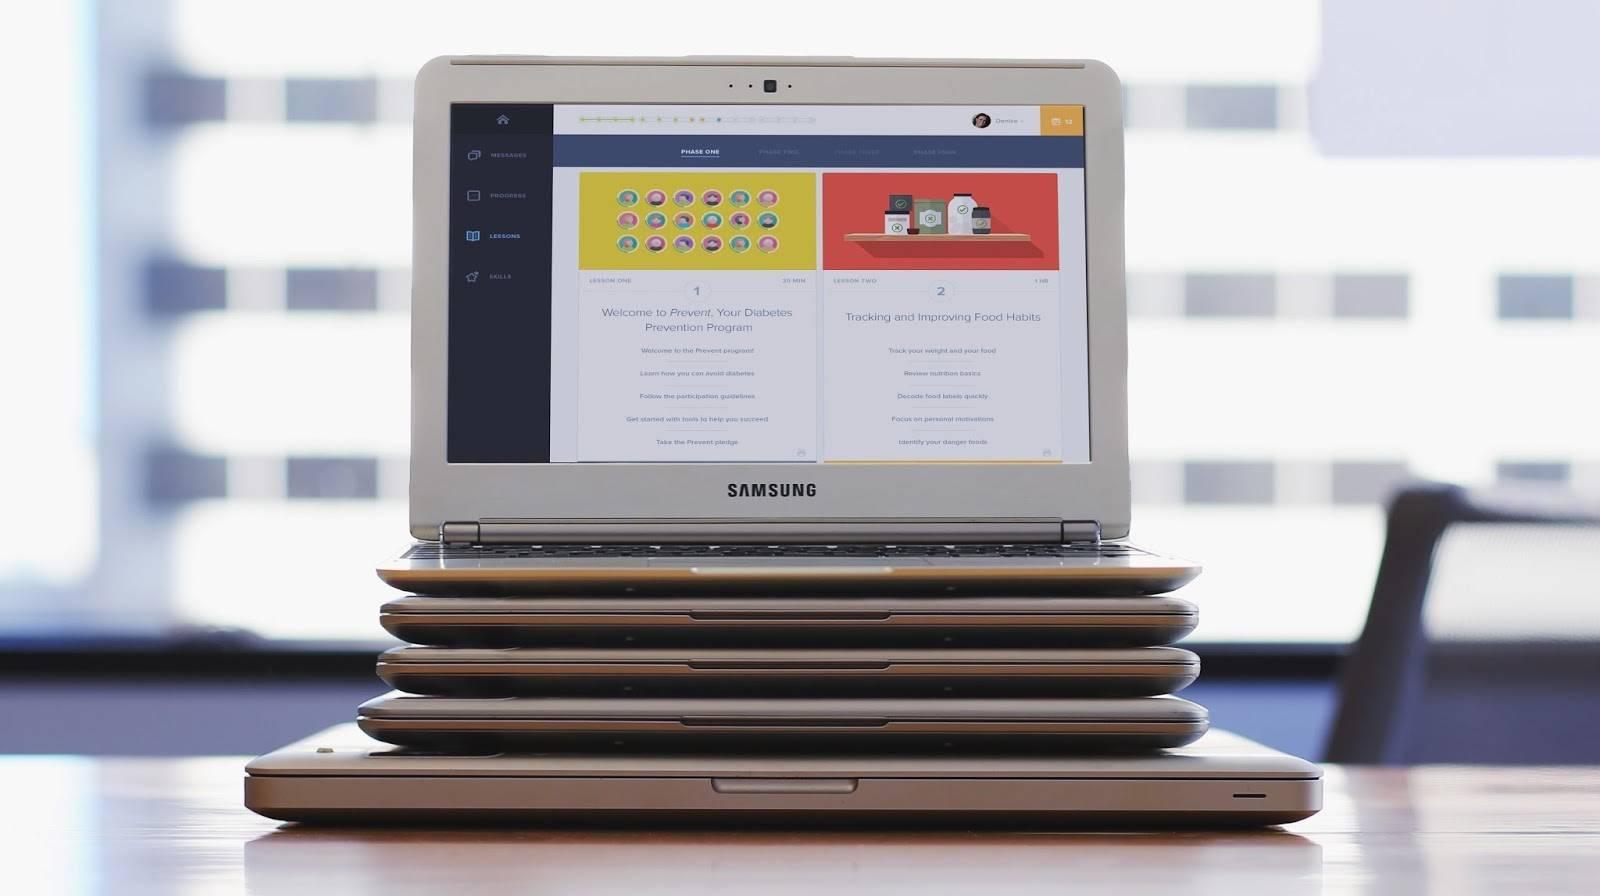 Neverware 这款软件能把你的旧电脑变成 Chromebook